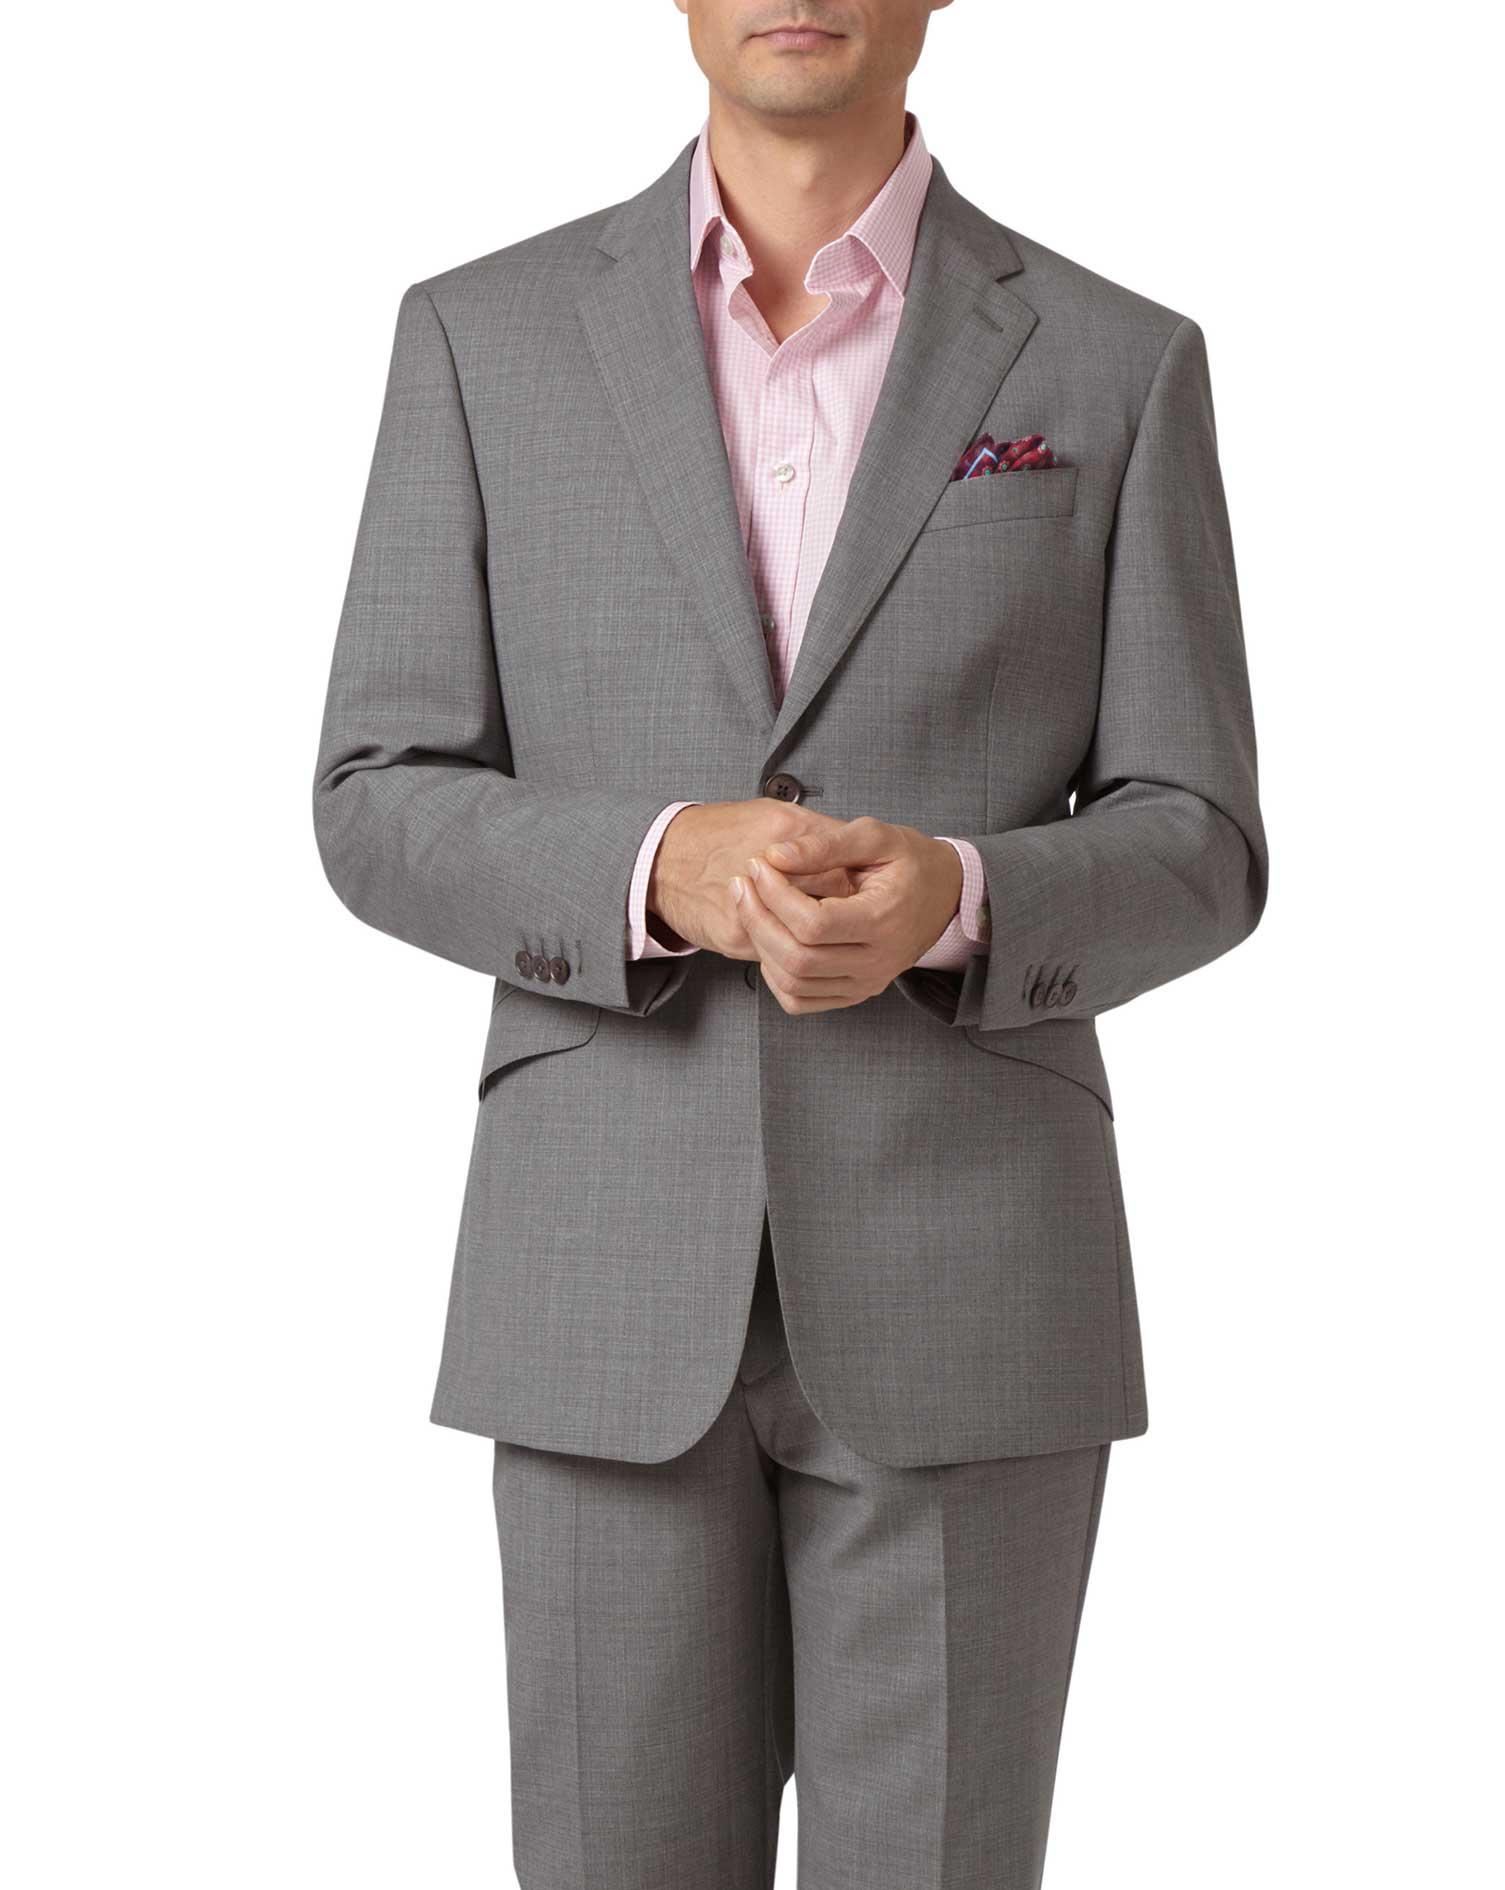 Silver Classic Fit Cross Hatch Weave Italian Suit Wool Jacket Size 44 Short by Charles Tyrwhitt